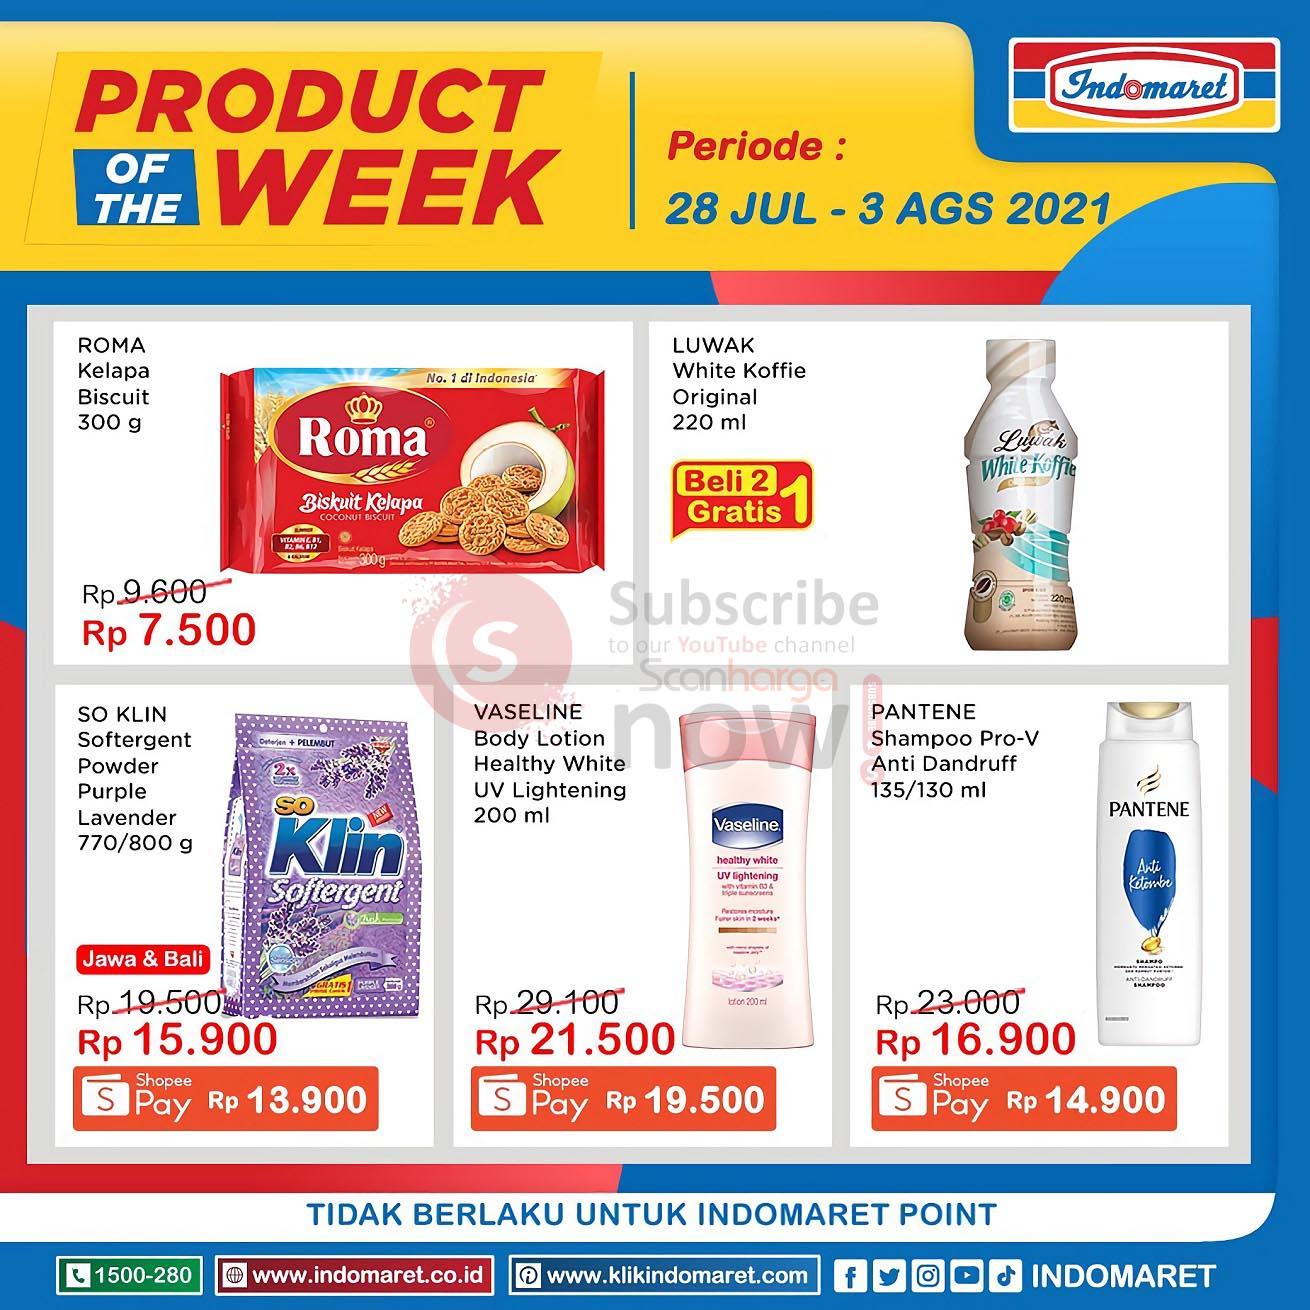 Katalog Indomaret Product Of The Week Promo PTW 28 Juli - 3 Agustus 2021